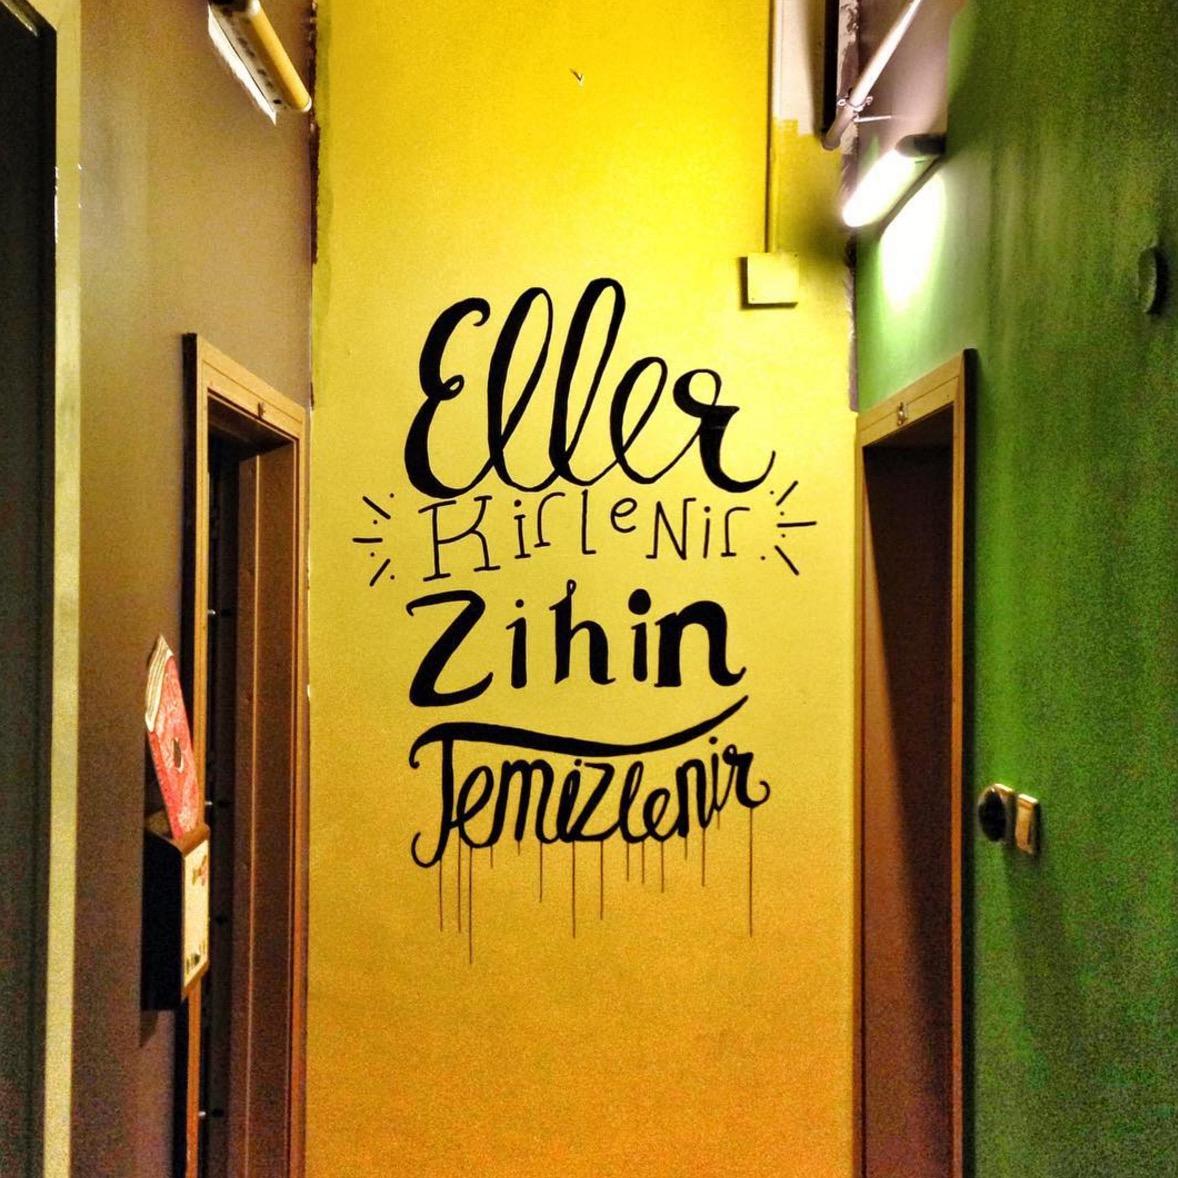 Koridora kaligrafi